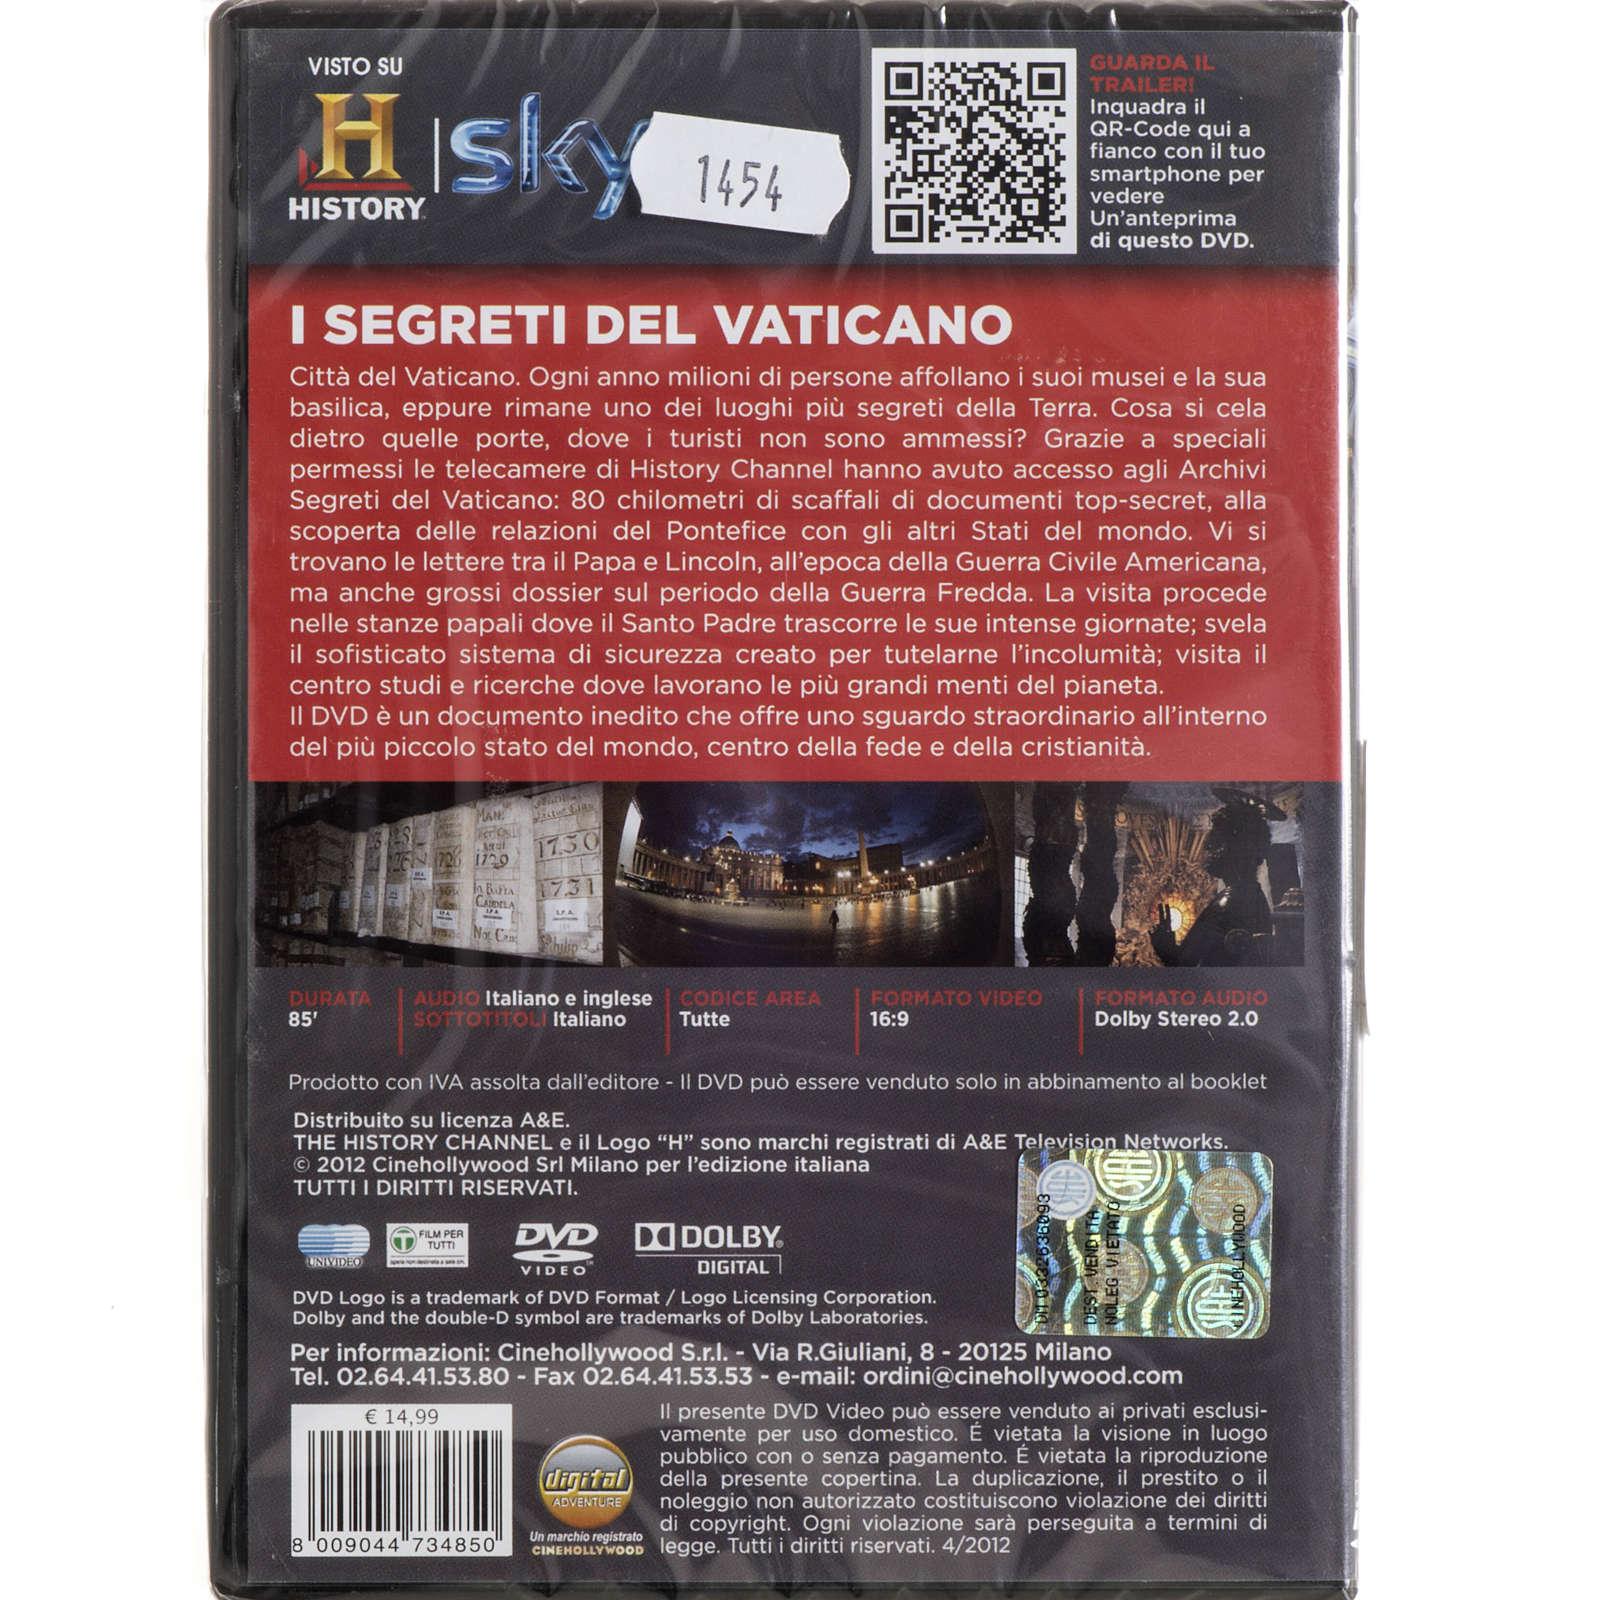 I segreti del Vaticano 3